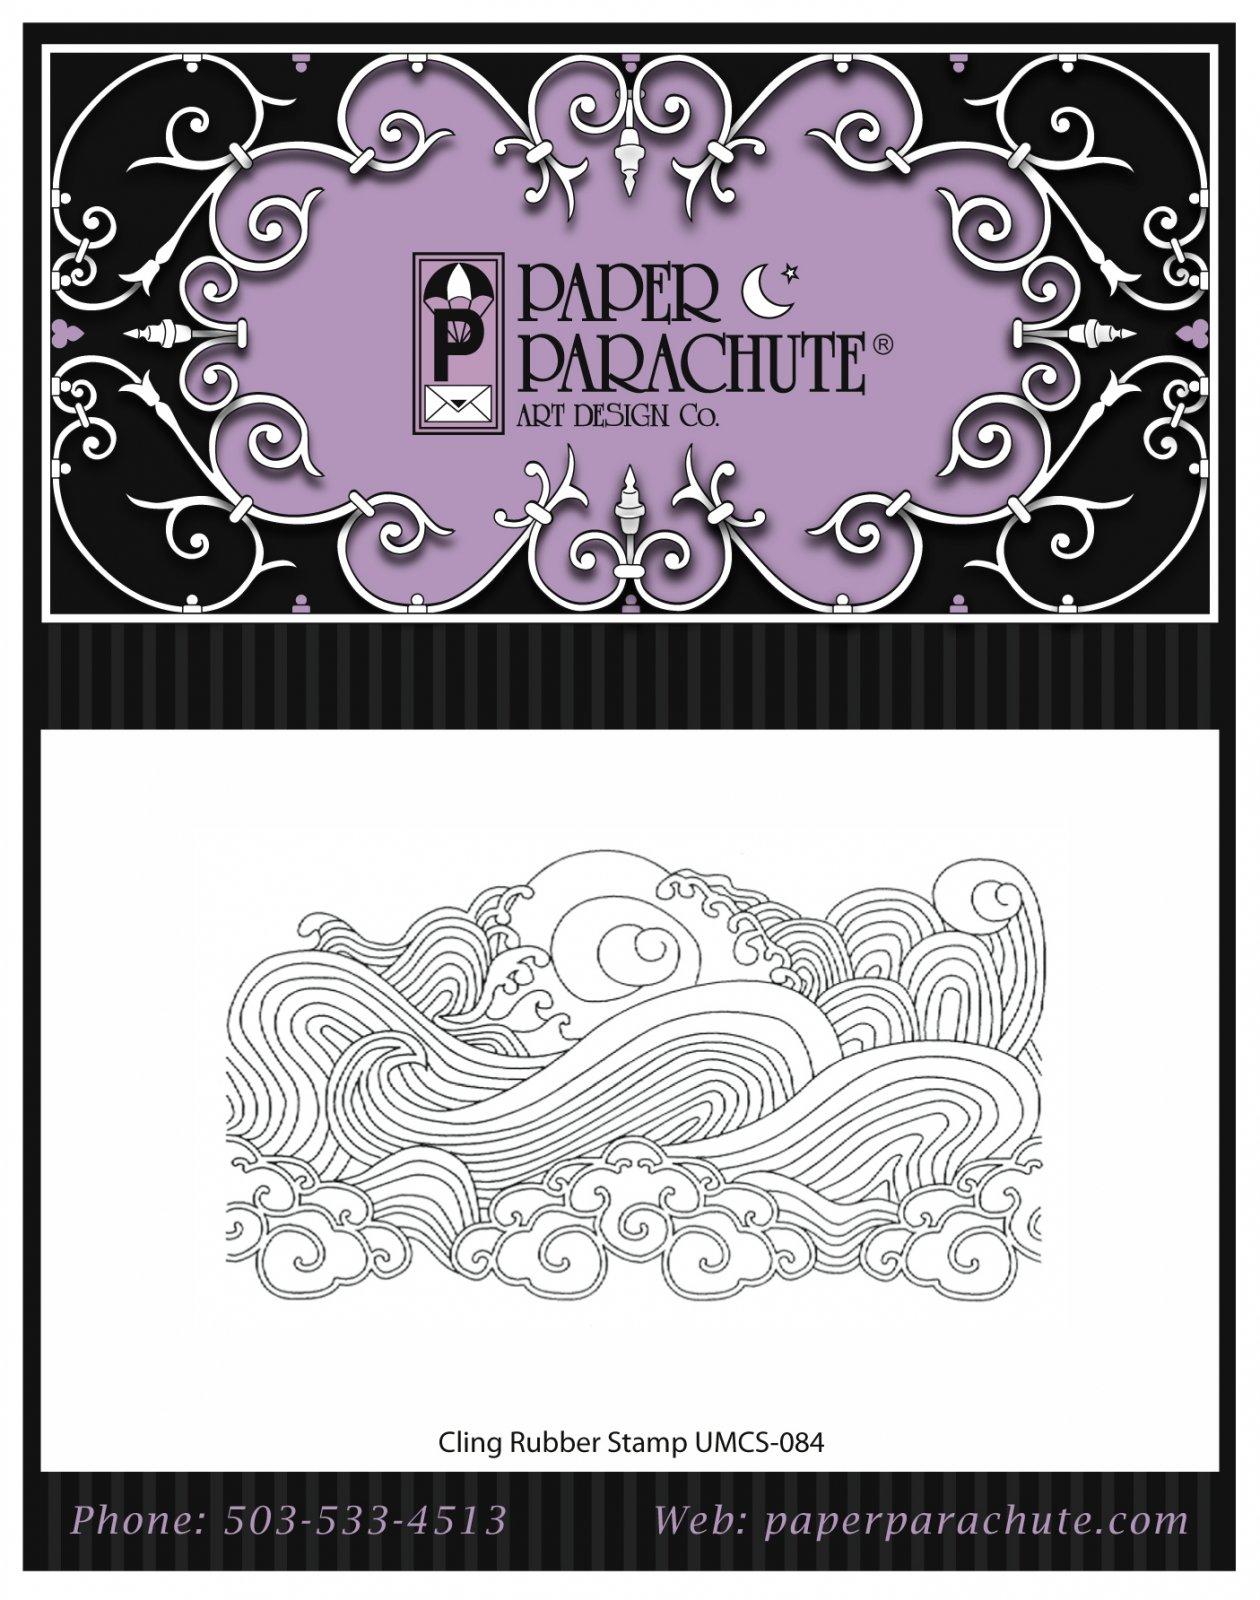 Paper Parachute Rubber Stamp - UMCS84